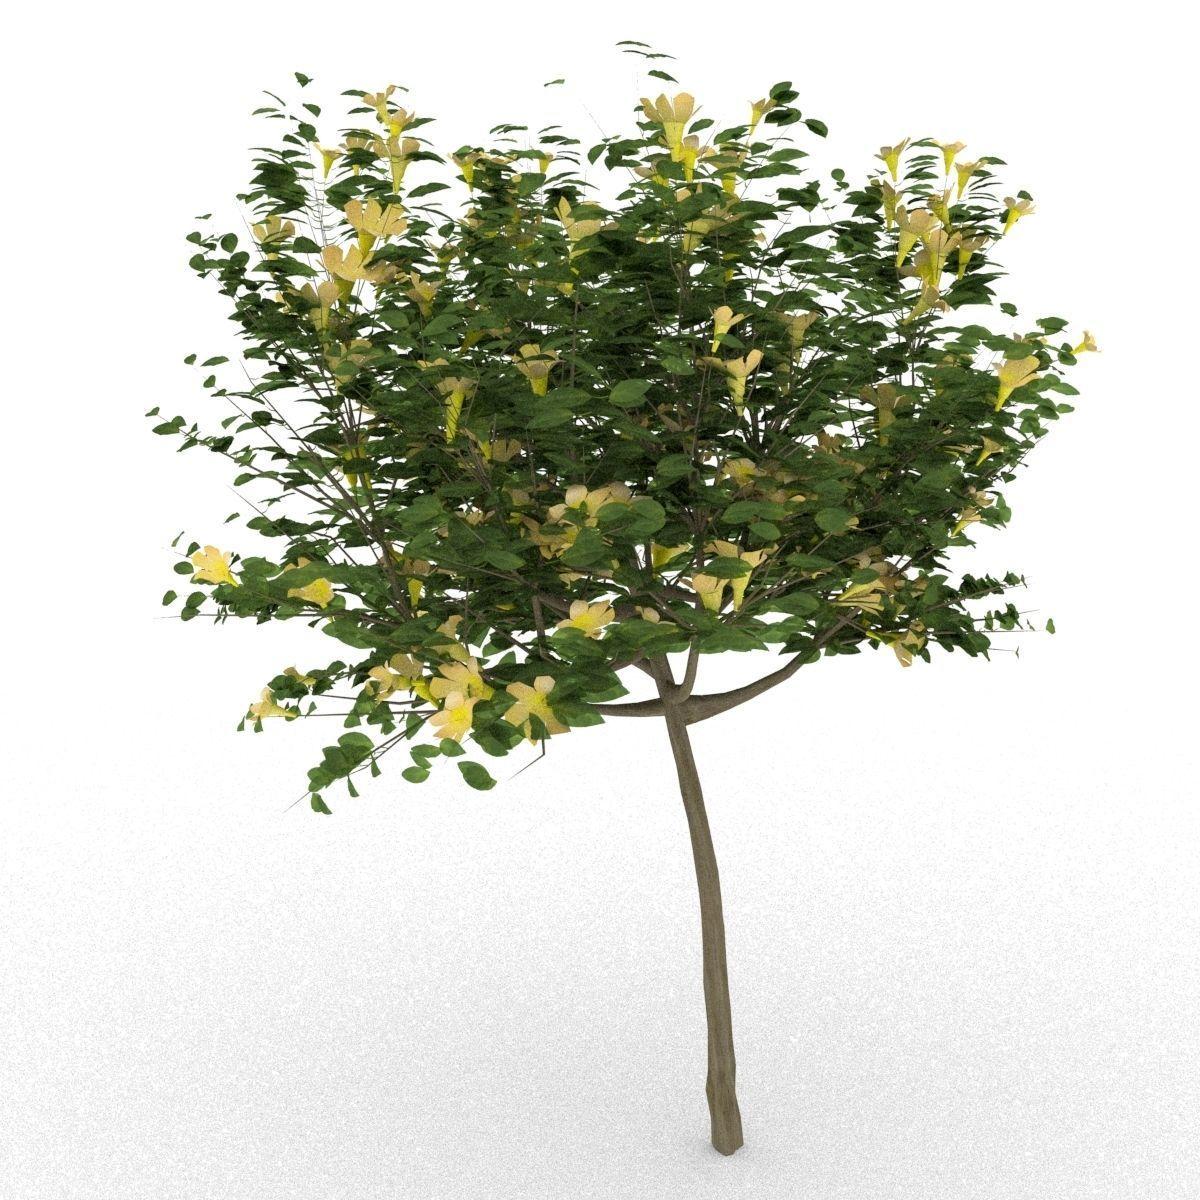 Allamanda cathartica 3d tree   3D model on kalanchoe pinnata plant, catharanthus roseus plant, golden trumpet plant, vining purple hoya plant, lantana plant, ficus lyrata plant, agave americana plant, desert spoon plant, yellow bells plant,